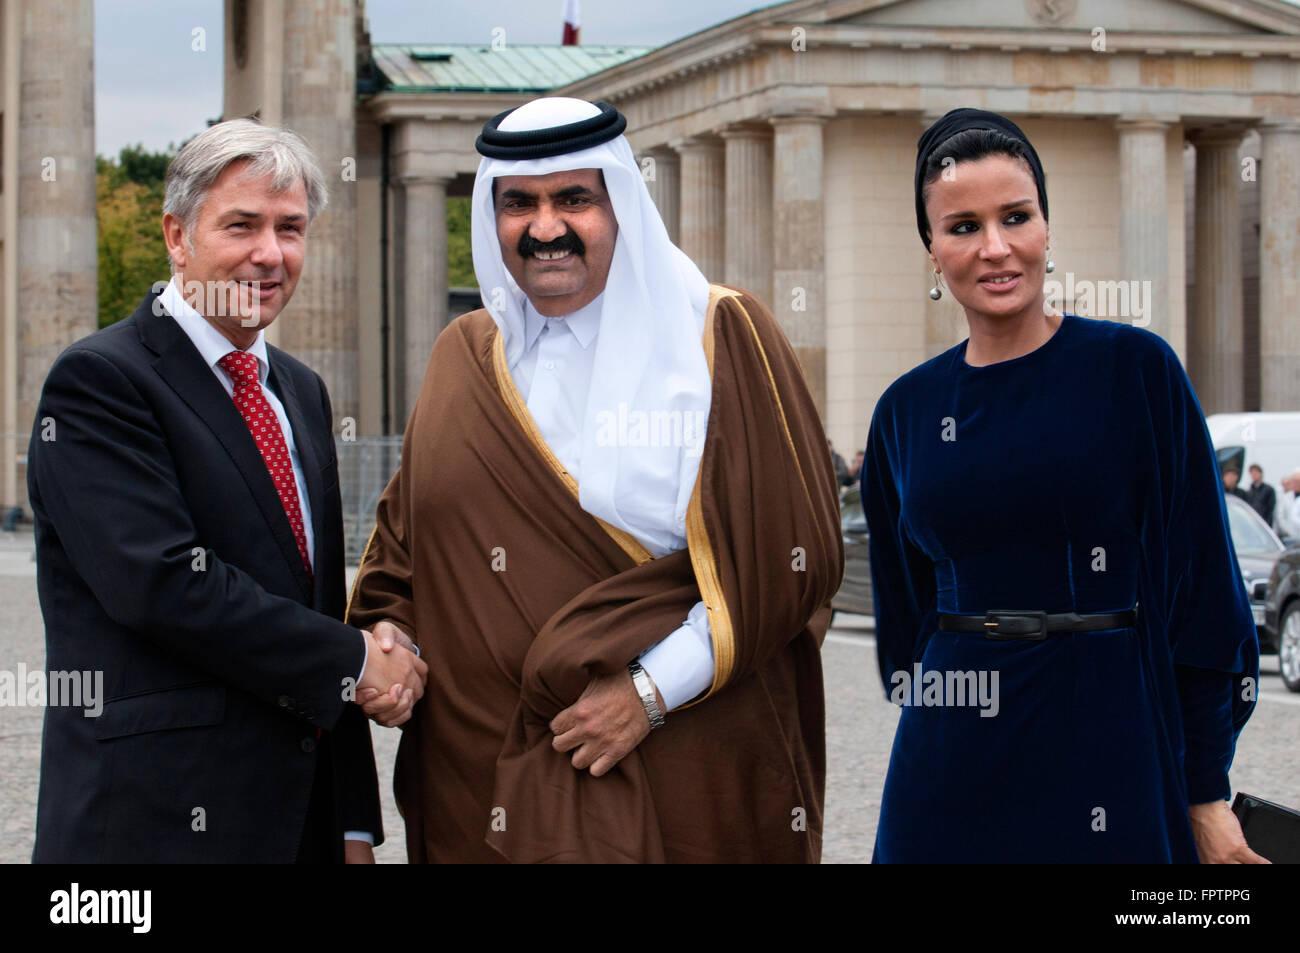 Berlin Major Klaus Wowereit (C), accompanies the Emir of Qatar, Hamad bin Khalifa Al Thani (L), and his wife Mozah Stock Photo